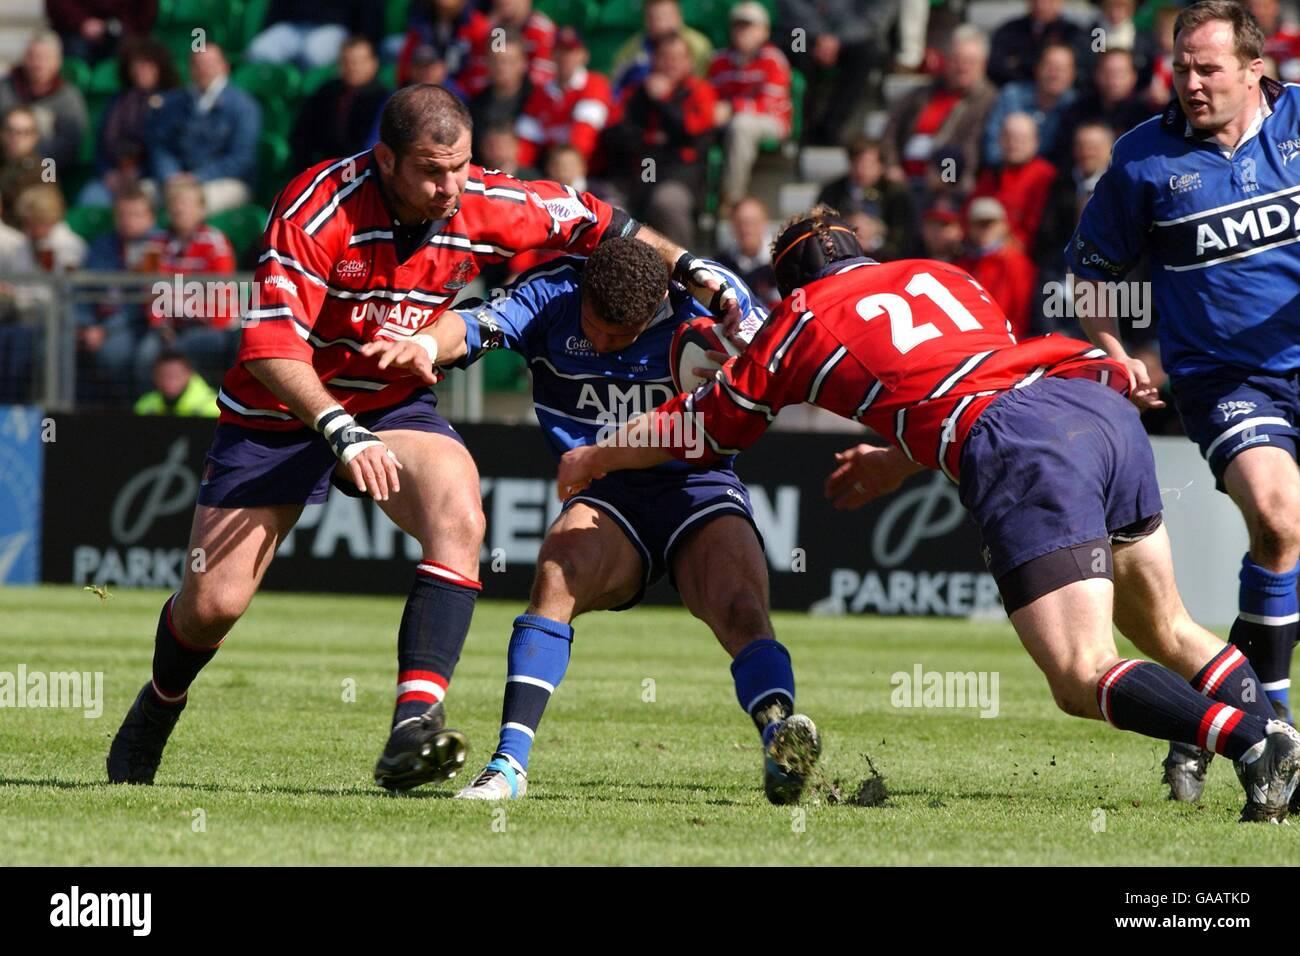 Rugby Union - Parker Pen European Shield - Semi Final - Gloucester v Sale Sharks - Stock Image